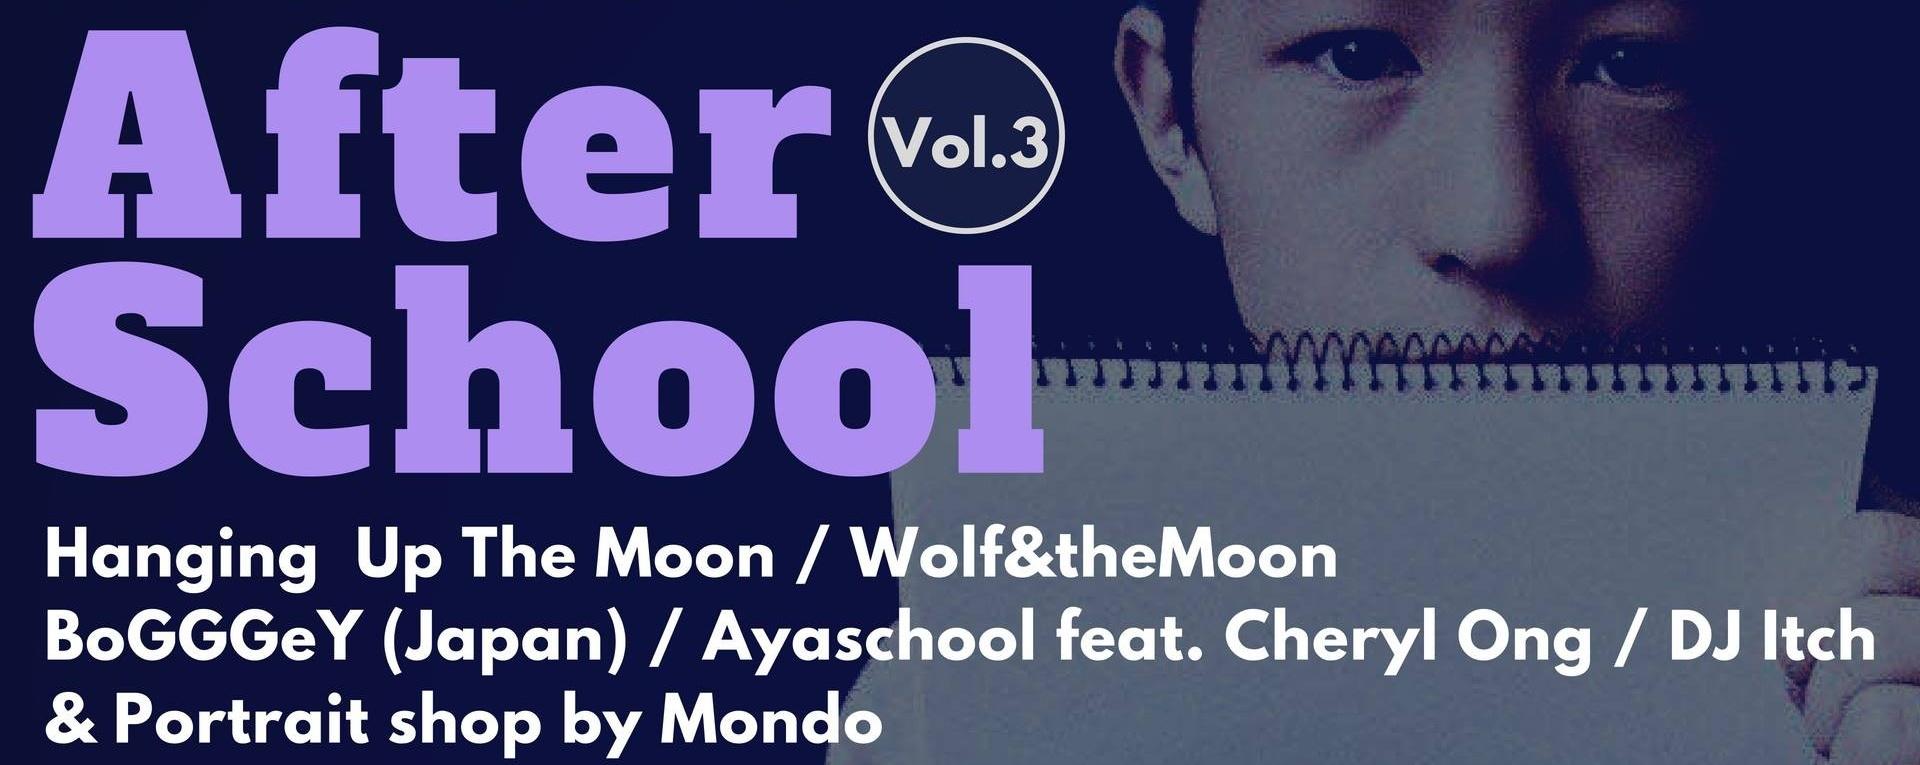 After School Vol.3